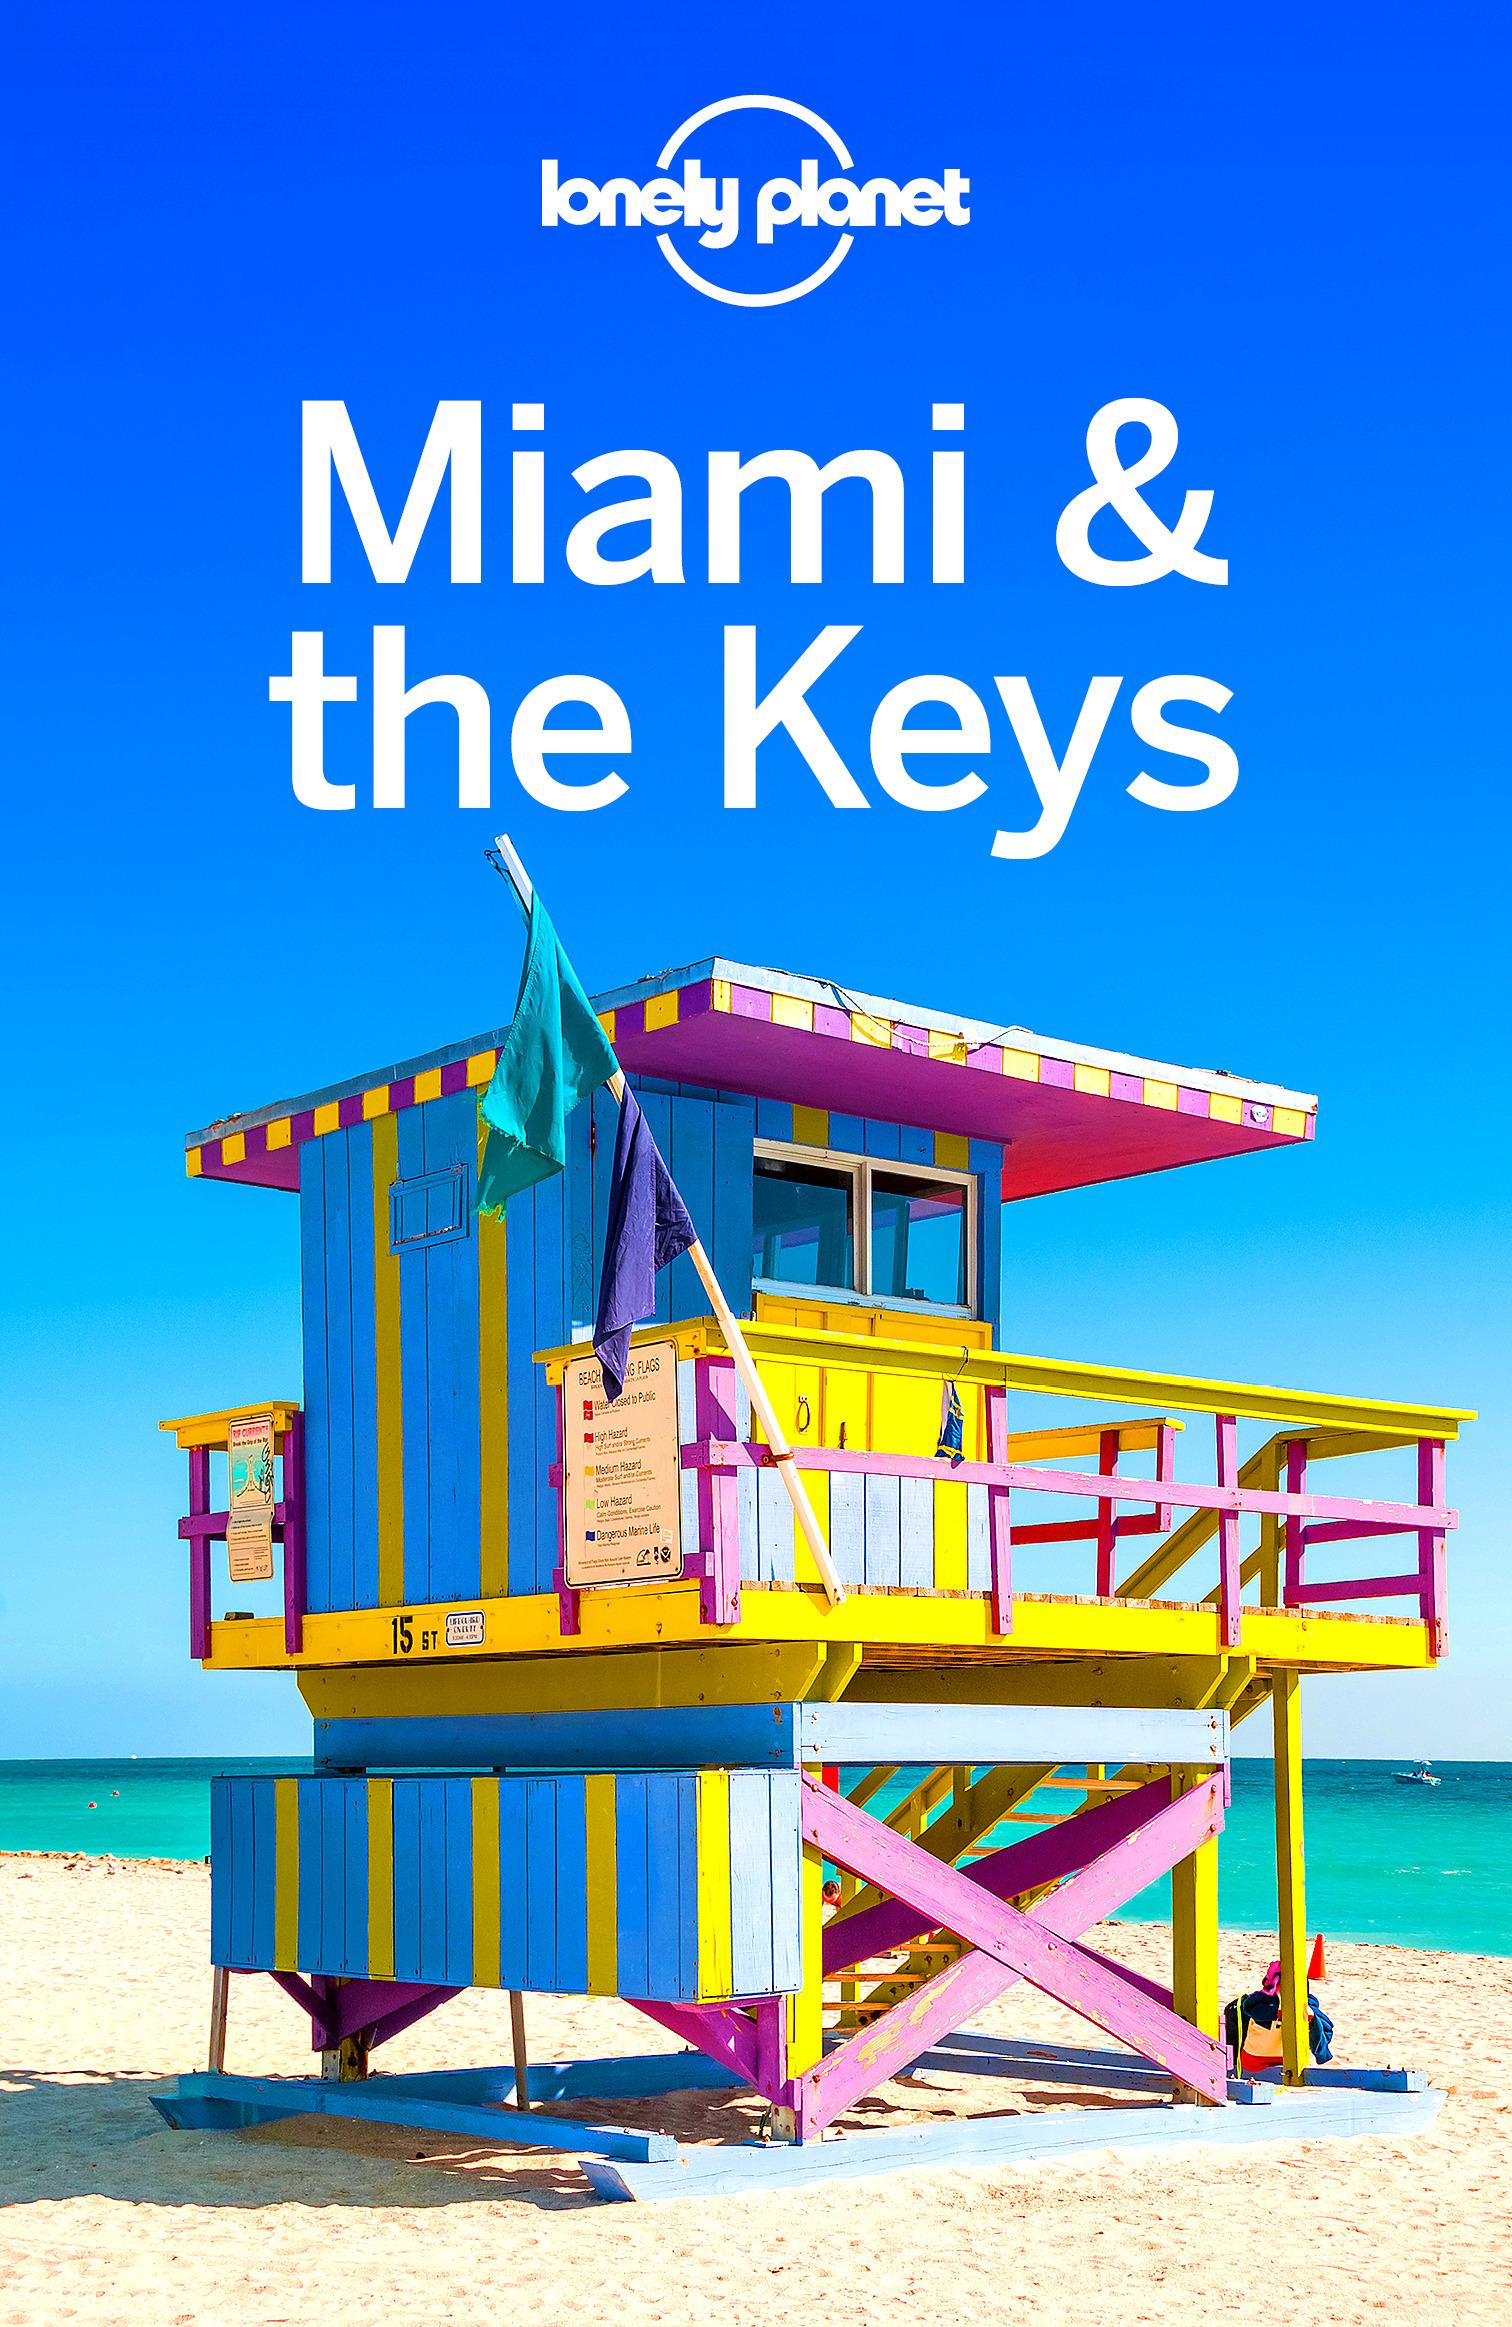 Louis, Regis St - Lonely Planet Miami & the Keys, ebook